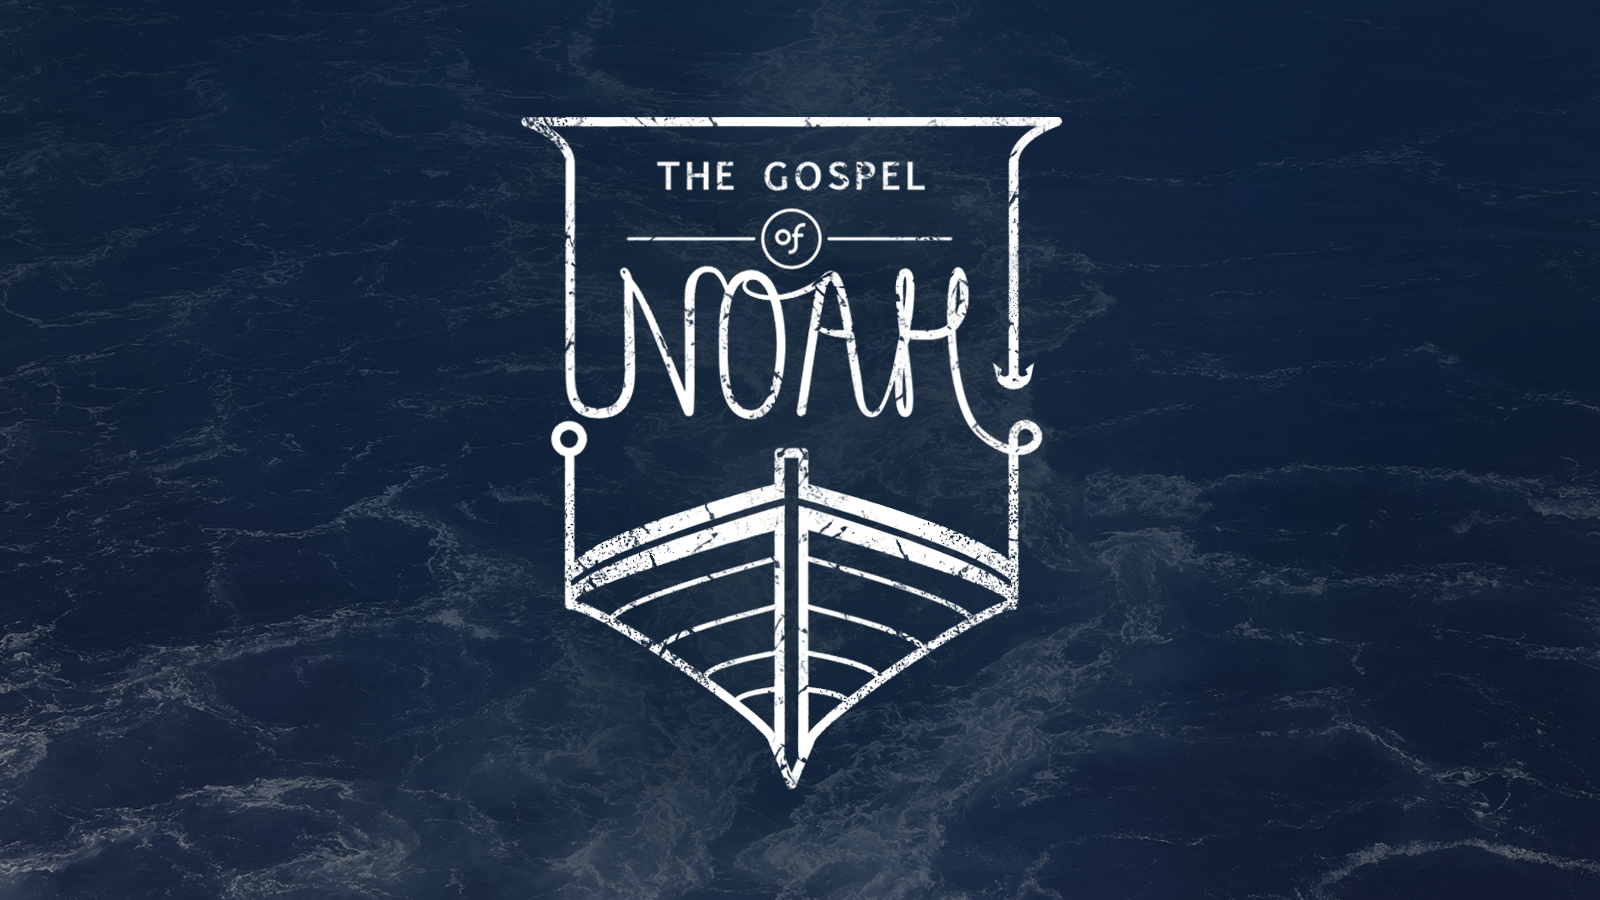 The_Gospel_Of_Noah_background.png